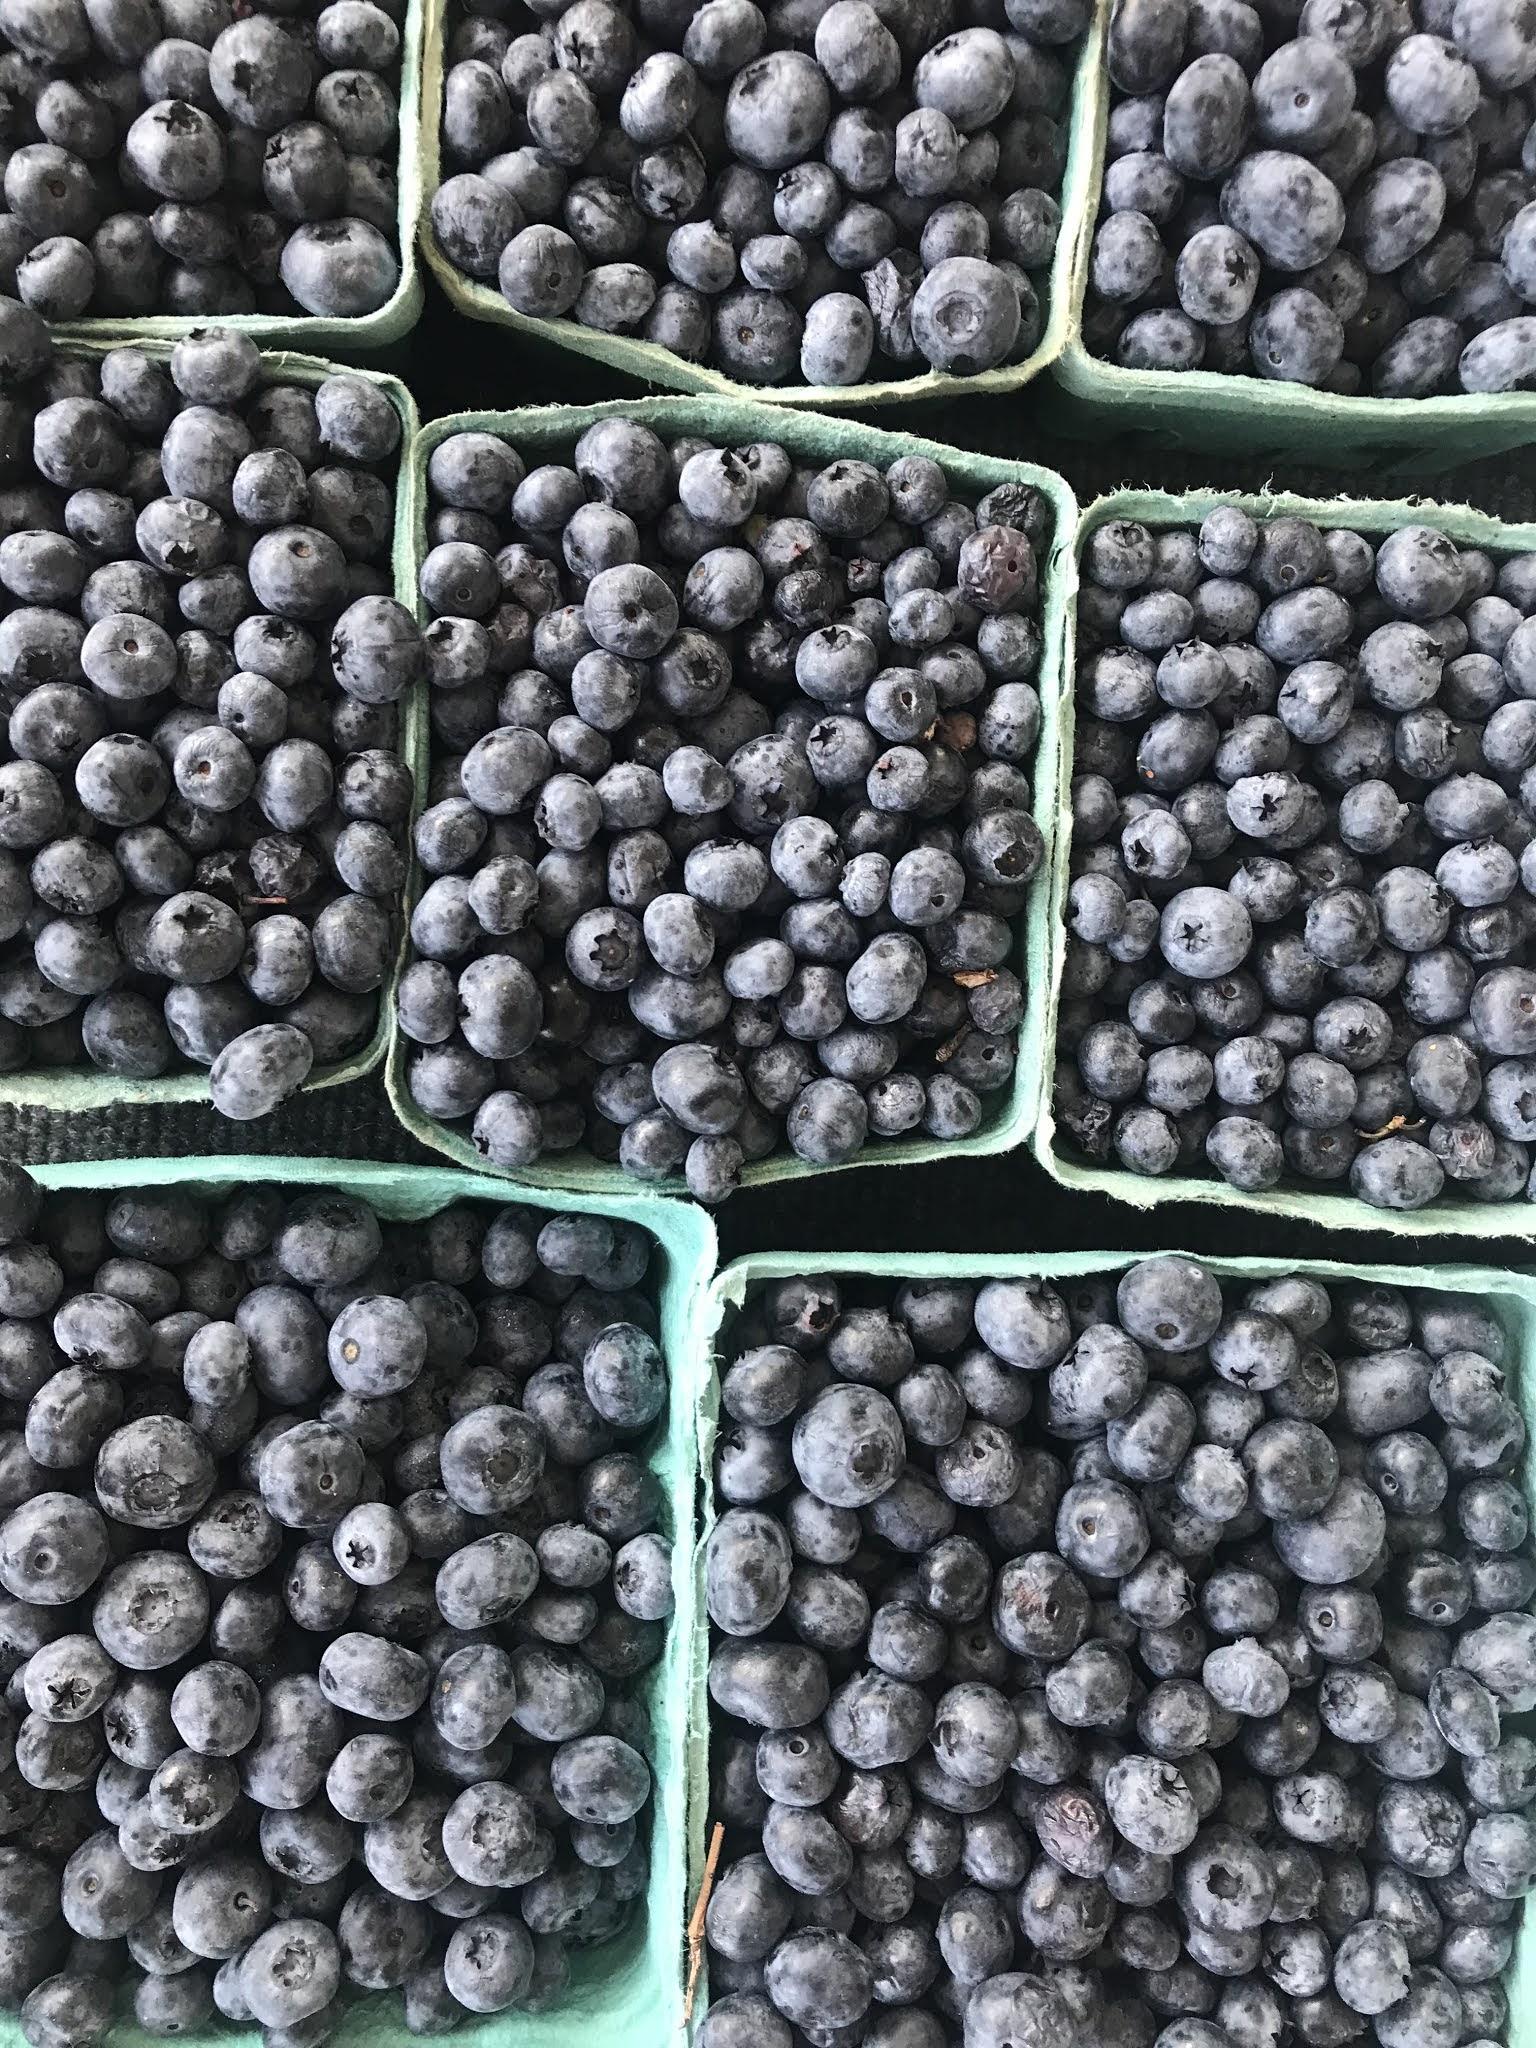 Farmers Market Blueberries | biblio-style.com